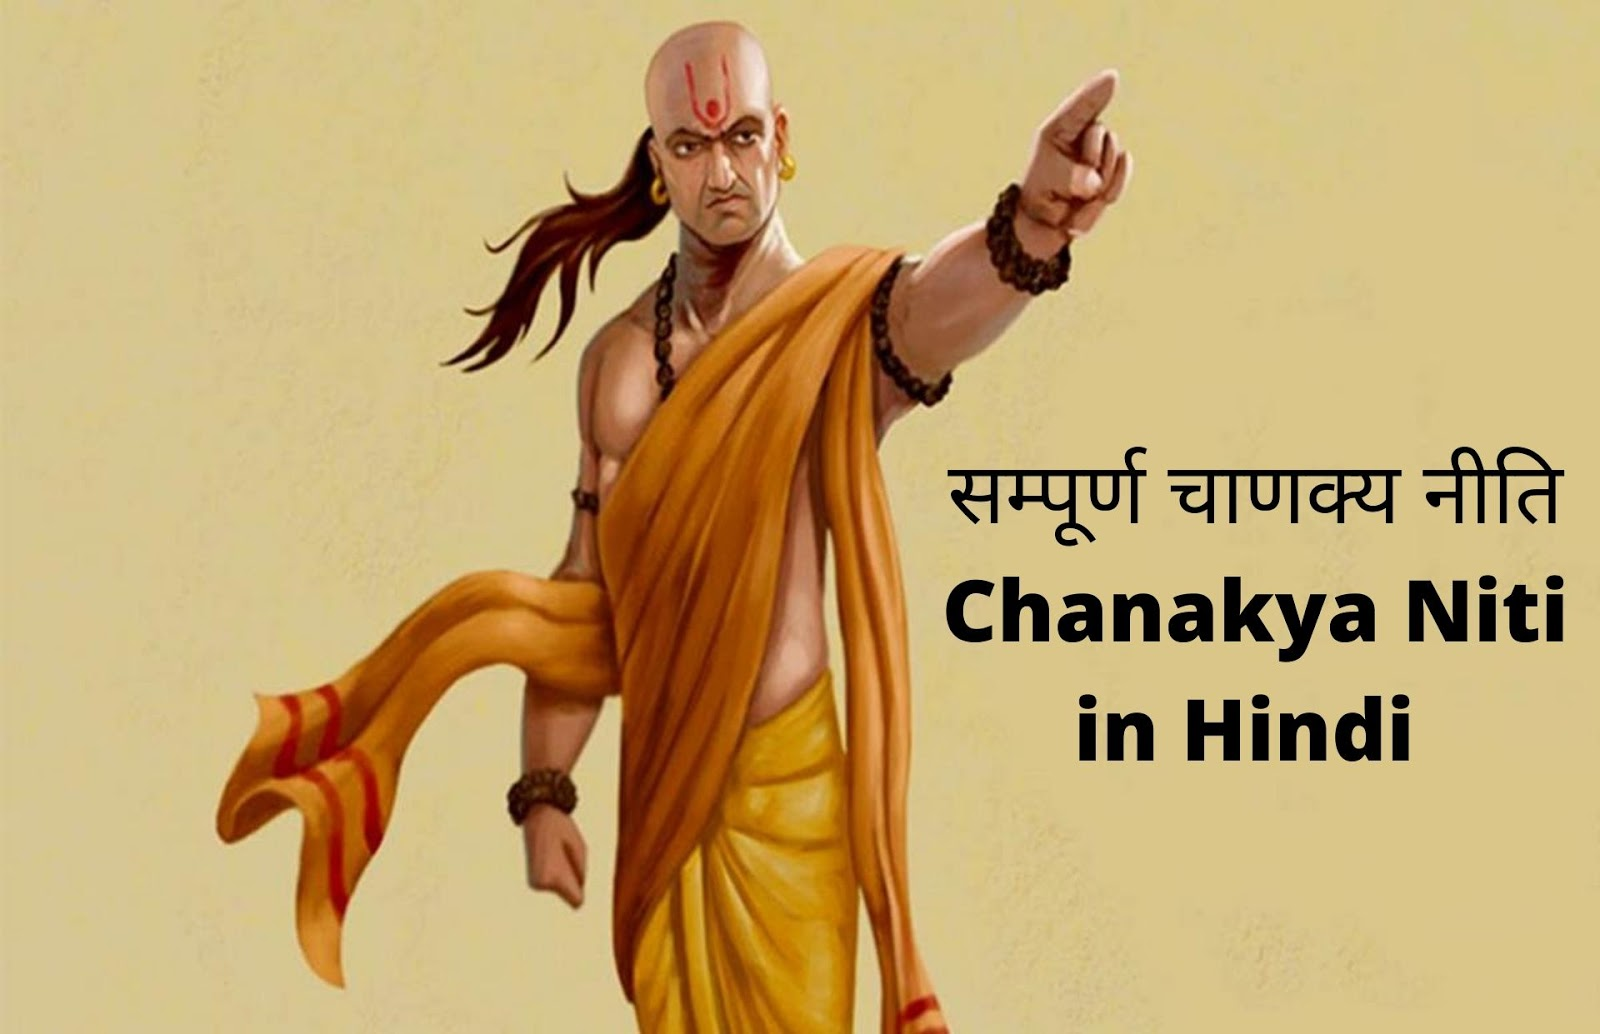 Chanakya Niti in Hindi | सम्पूर्ण चाणक्य नीति | Niti in Hindi